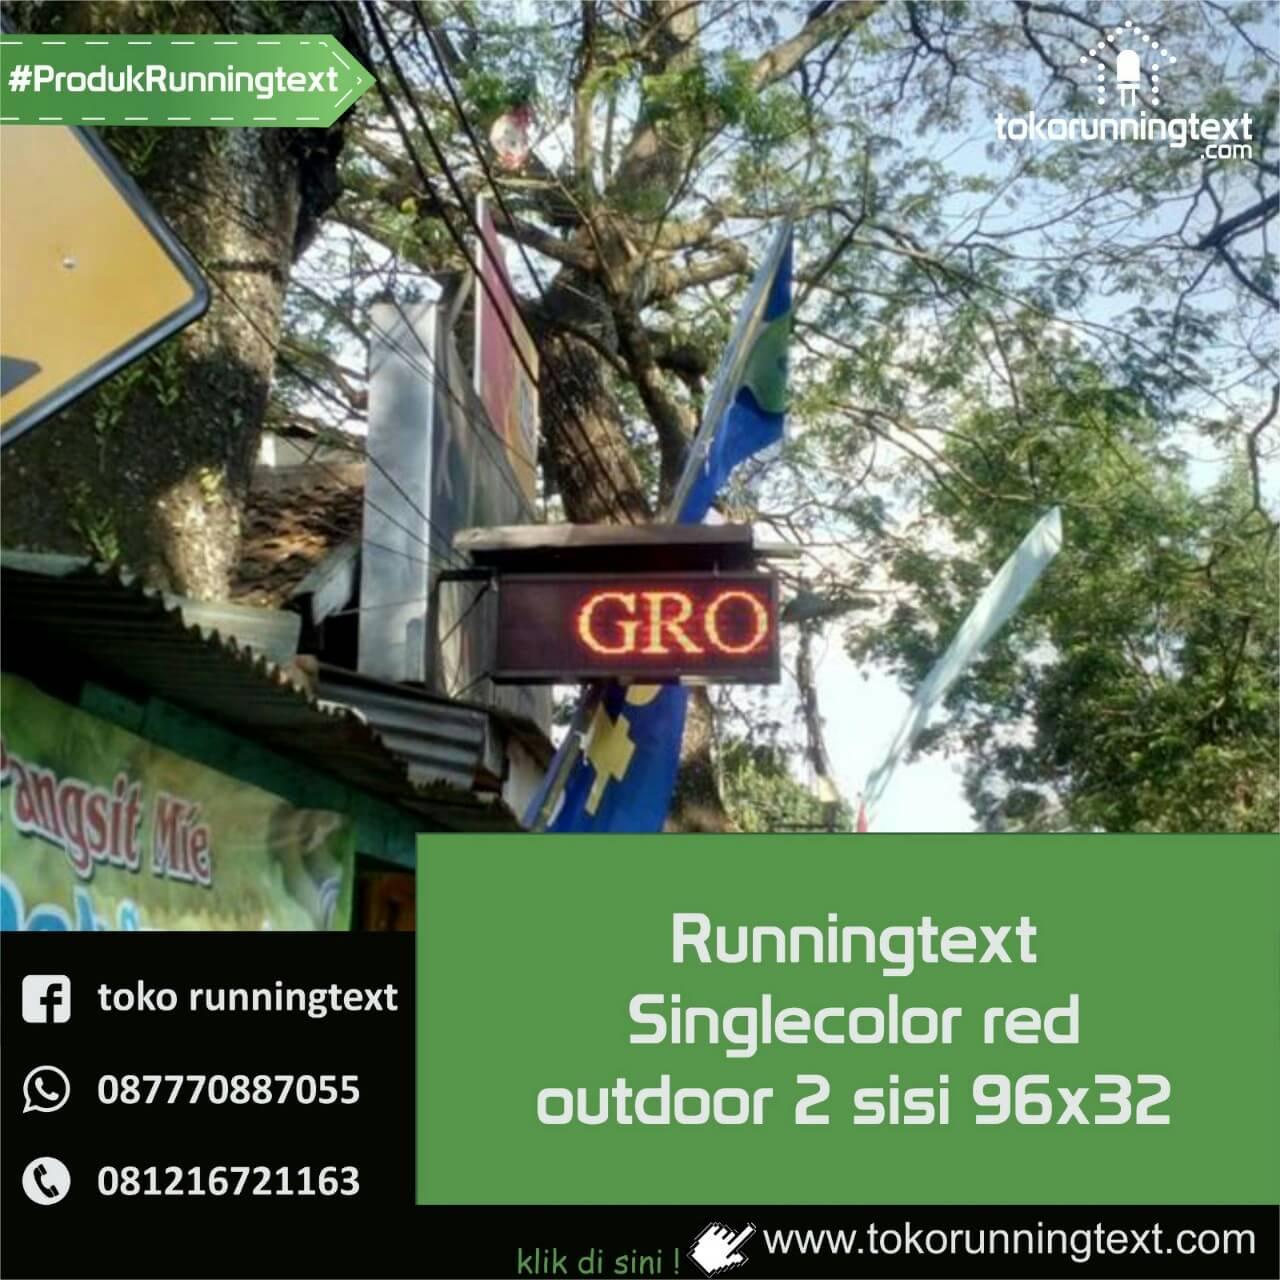 Runningtext singlecolor Red outdoor 2 sisi 96x32